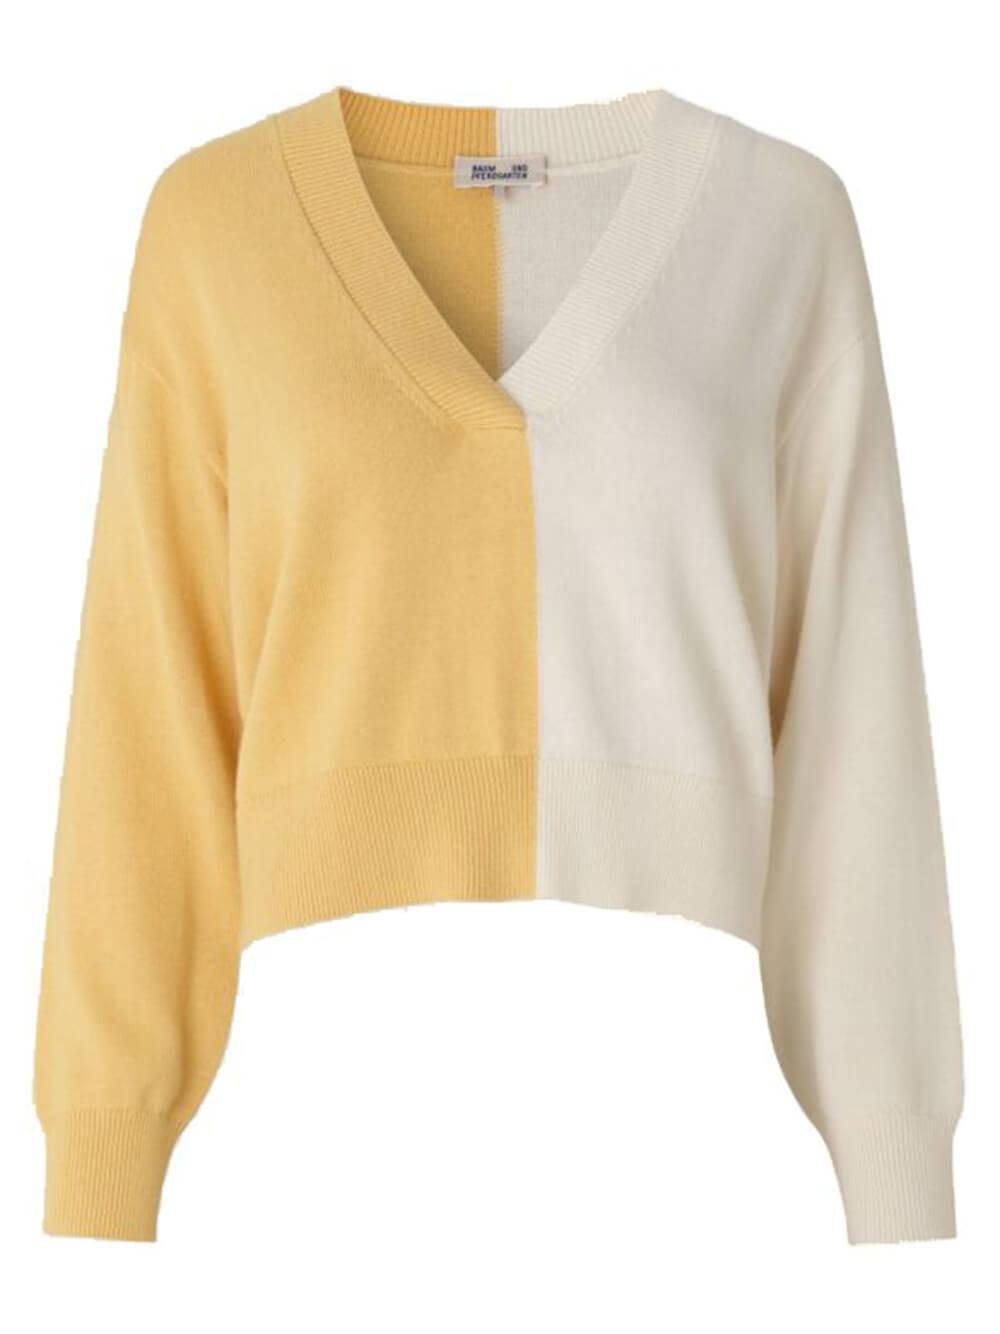 Coyra Colorblock Sweater Item # 21787